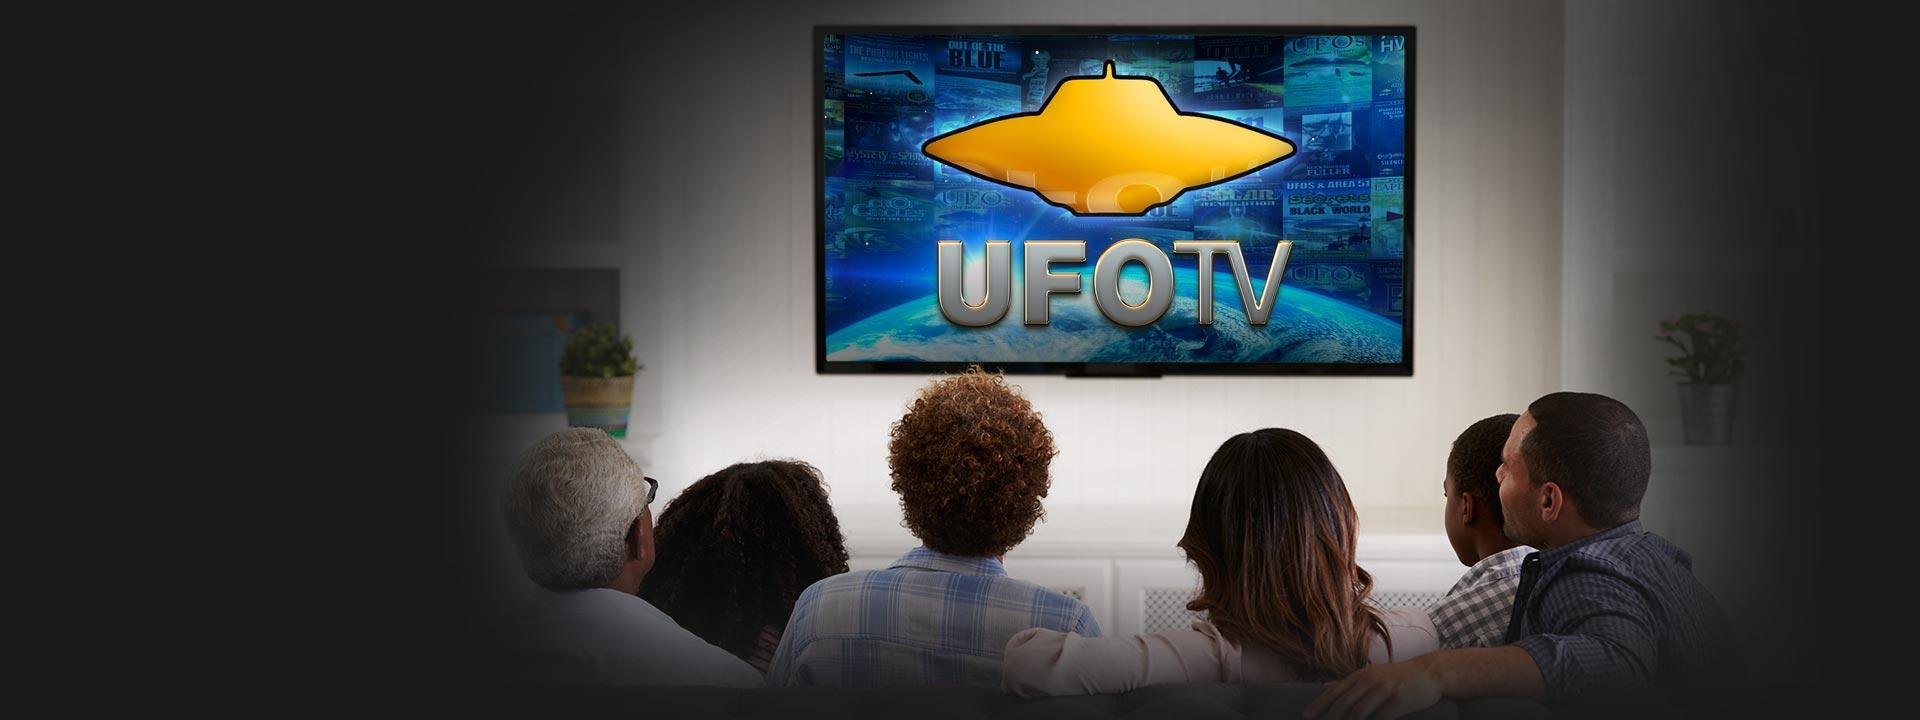 UFOTV - Watch Everywhere